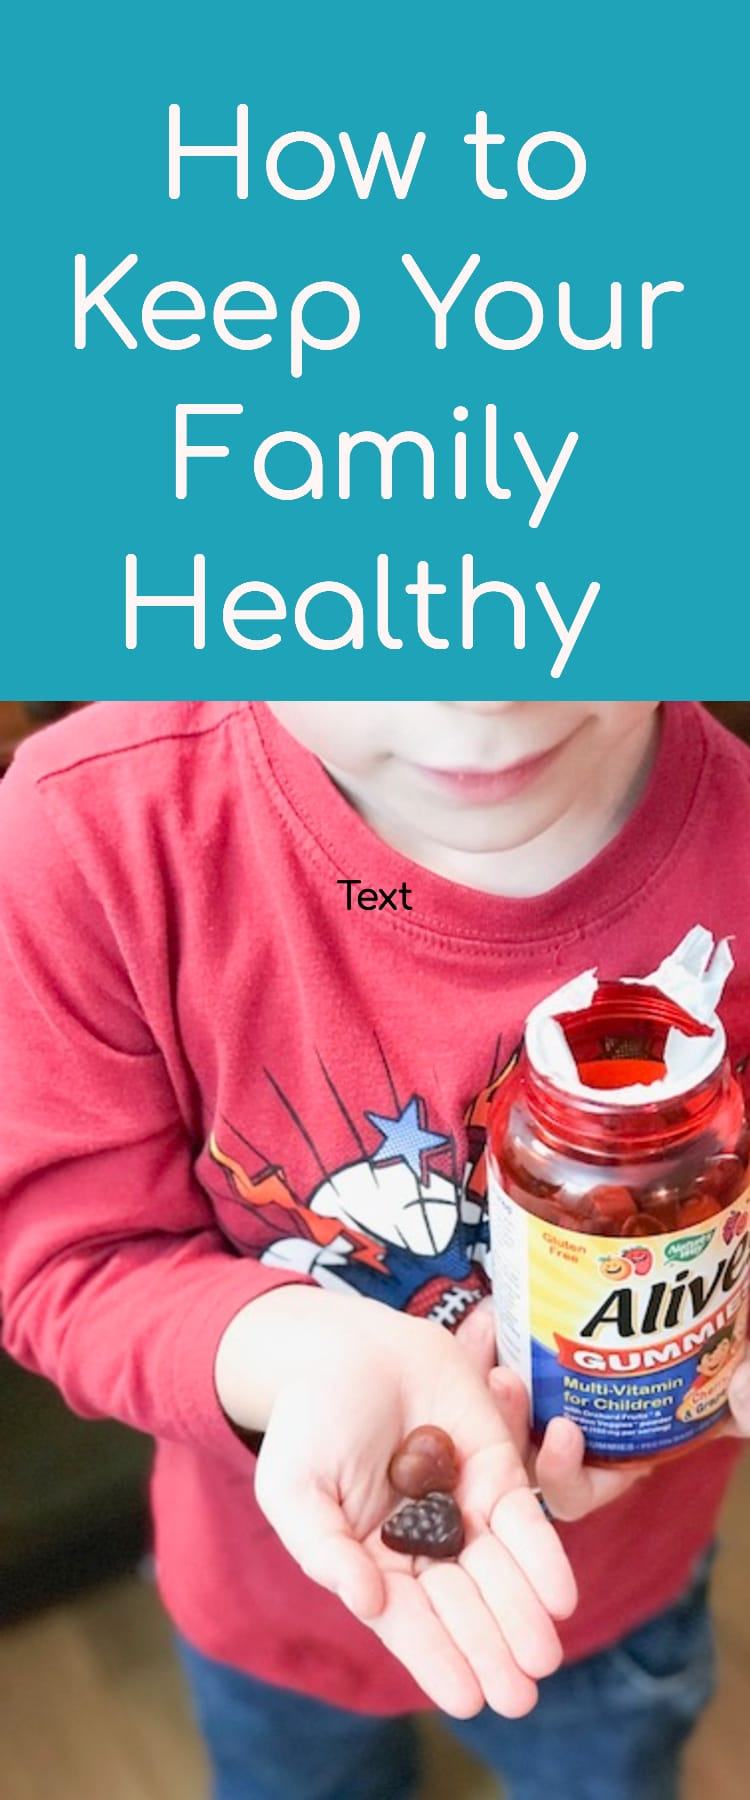 Health / Healthy Living / Healthy Tips / Natural Health / Kids / #Healthy #health via @clarkscondensed